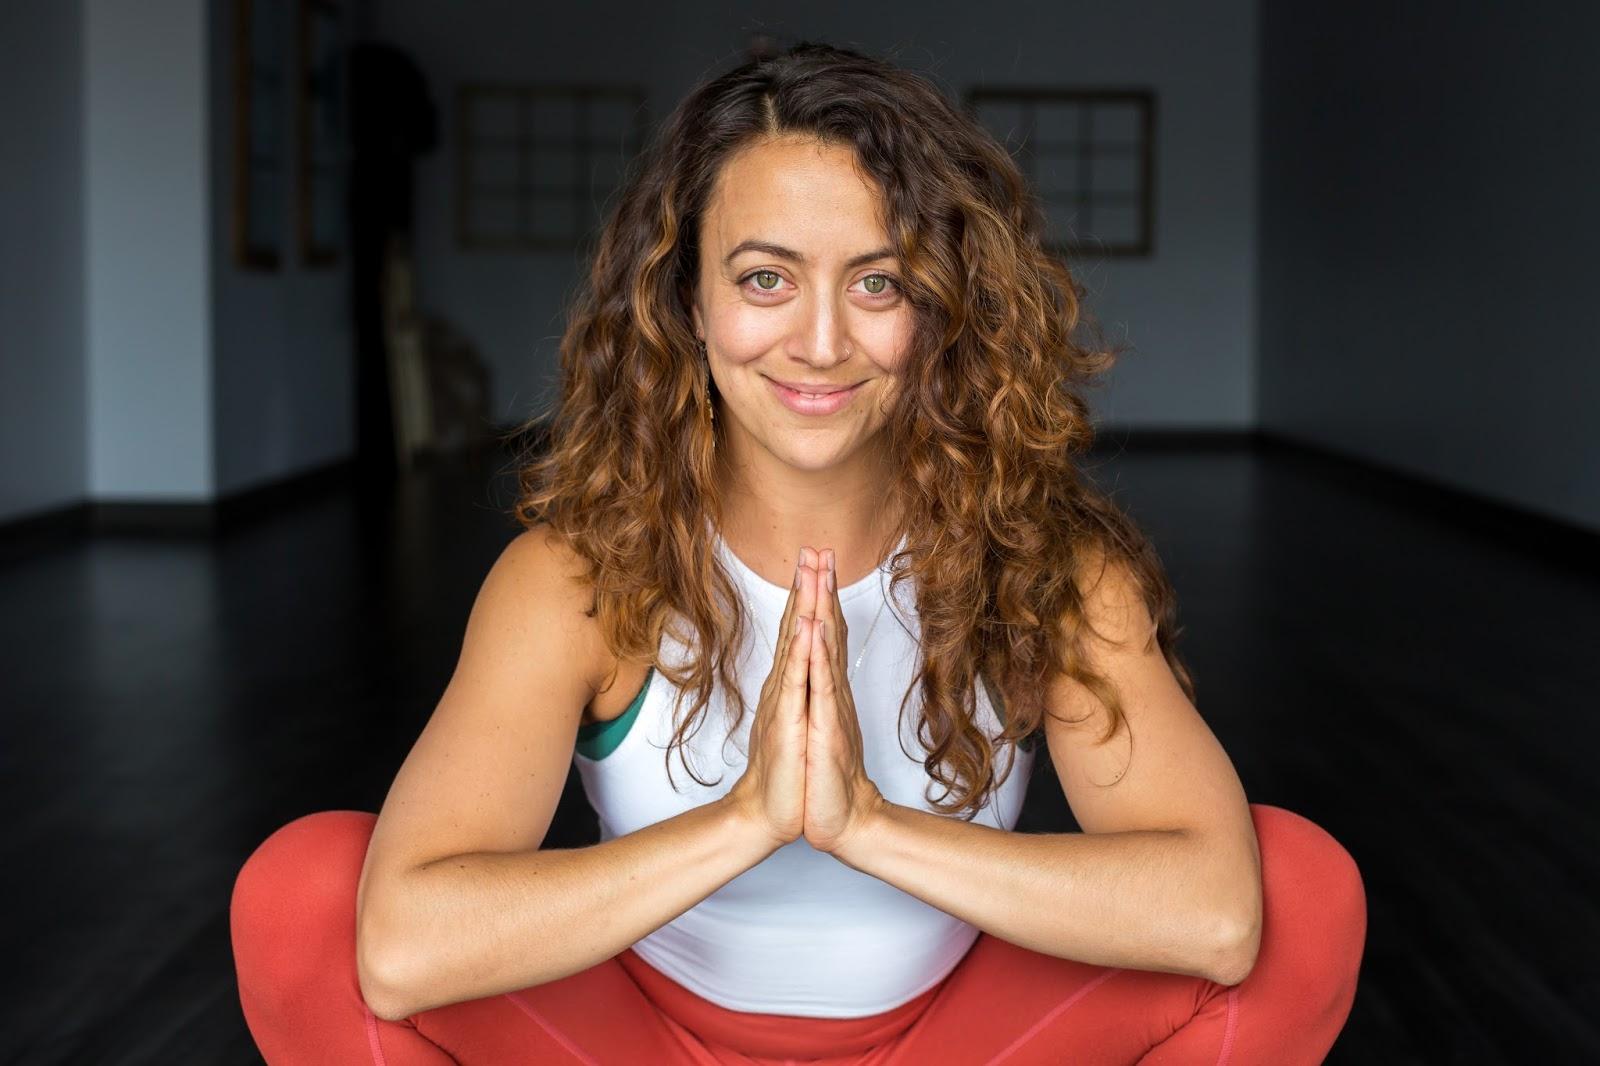 juliana-cole-dc-yoga-photography-yoga-heights